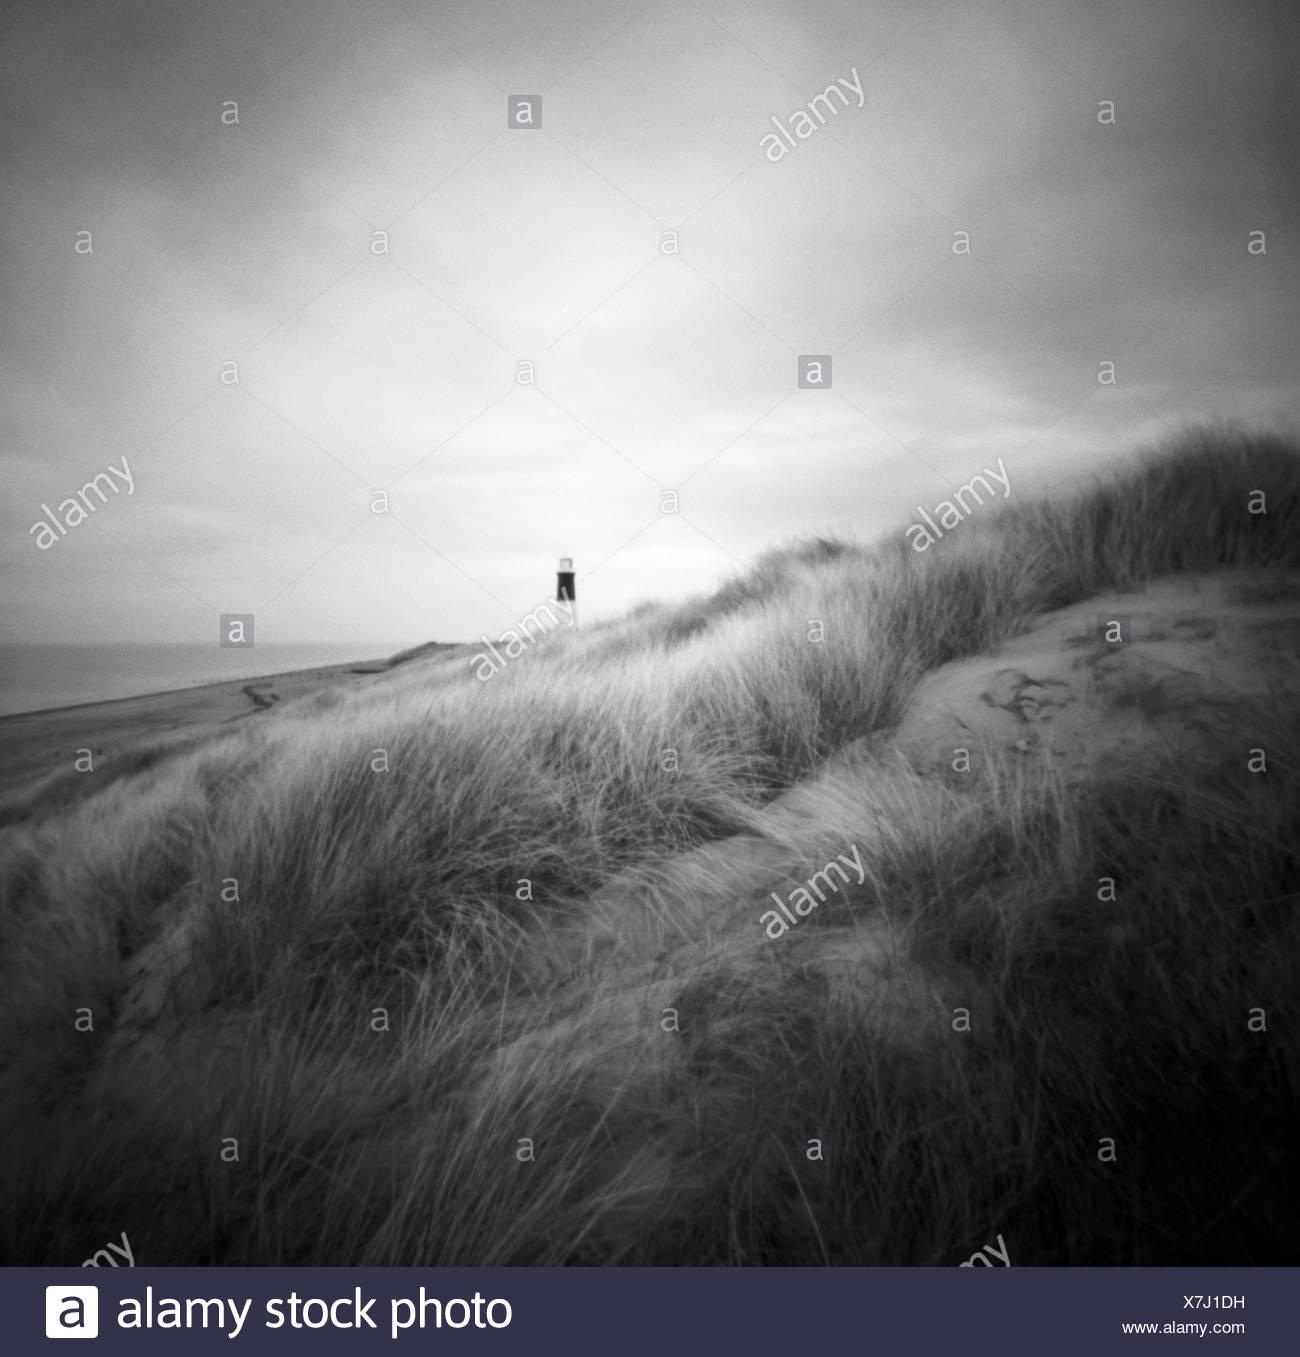 Single figure on sand banks at Seashore Spurn Head Point Lighthouse, East Yorkshire, England - Stock Image